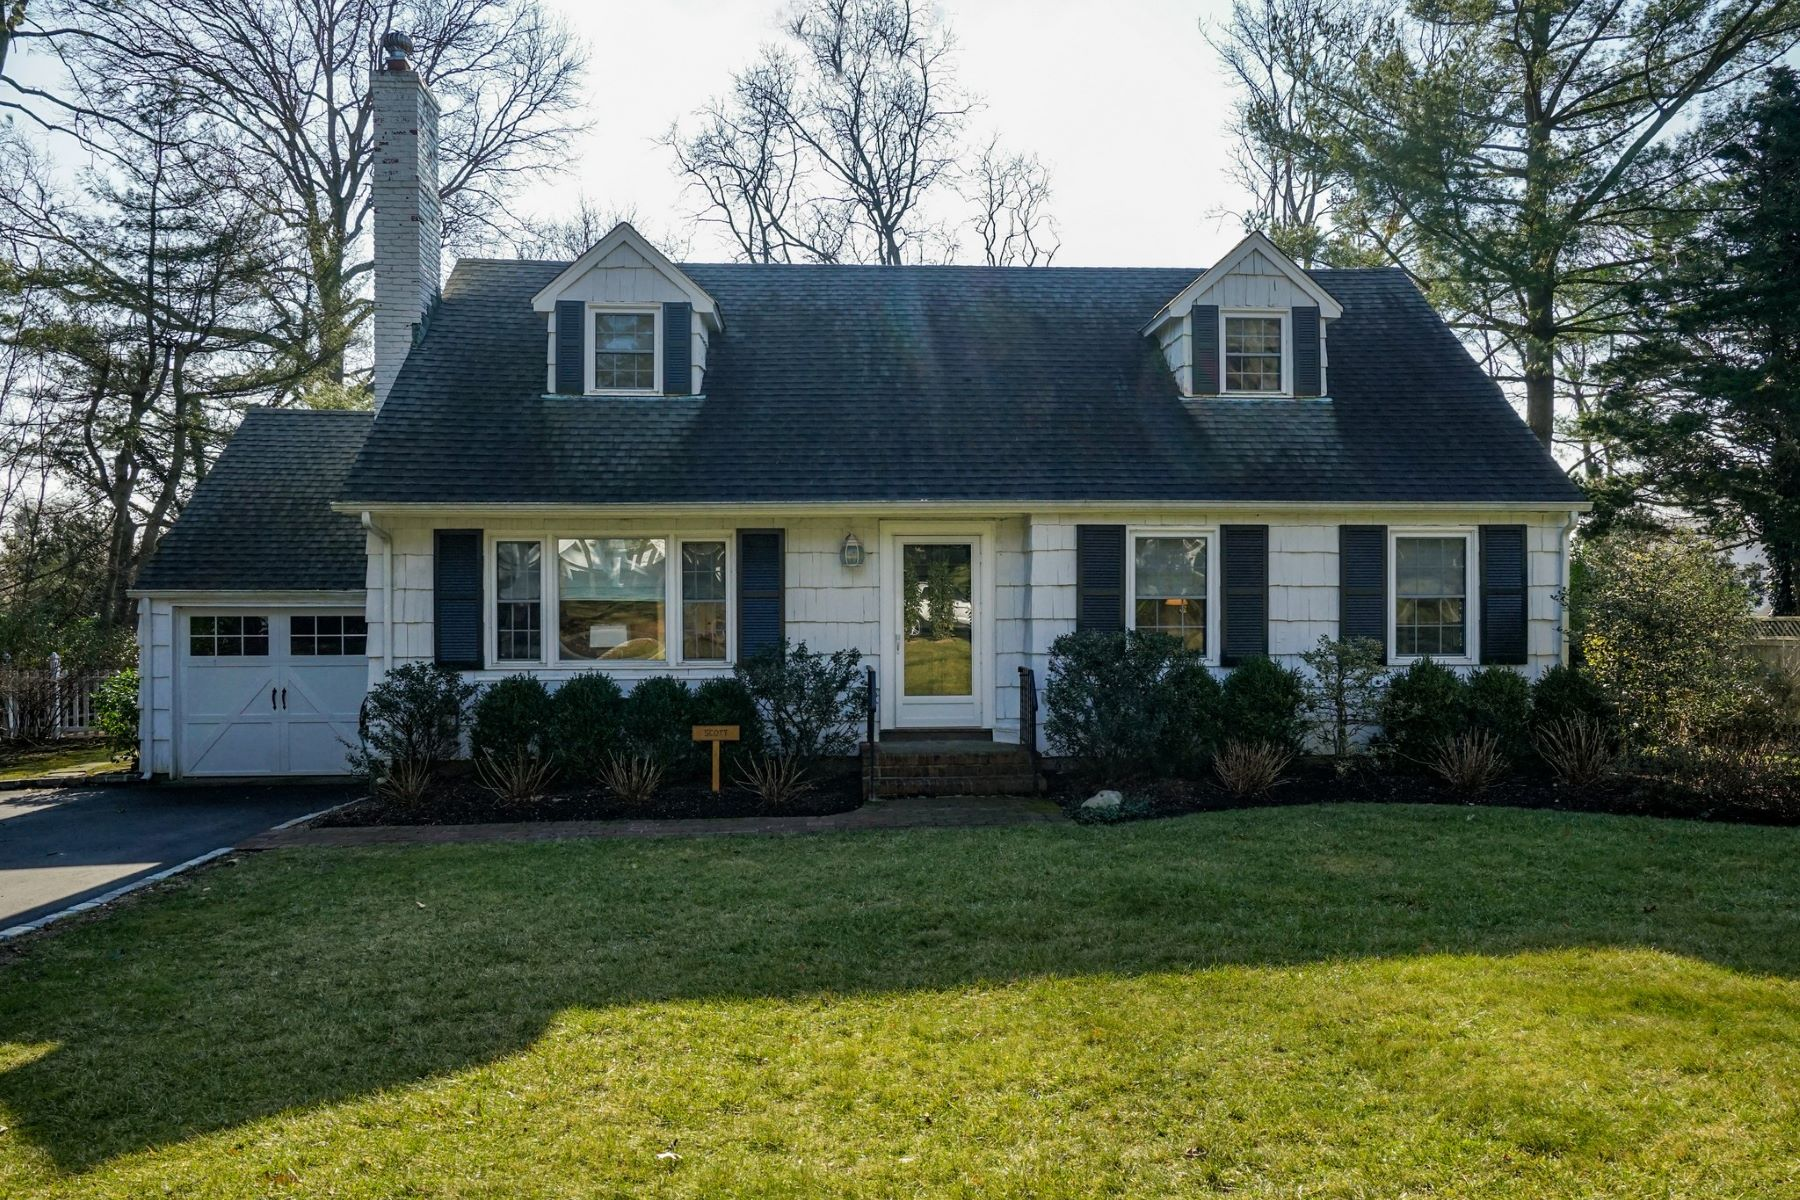 Single Family Homes for Sale at Lattingtown 15 Wood Lane Lattingtown, New York 11560 United States